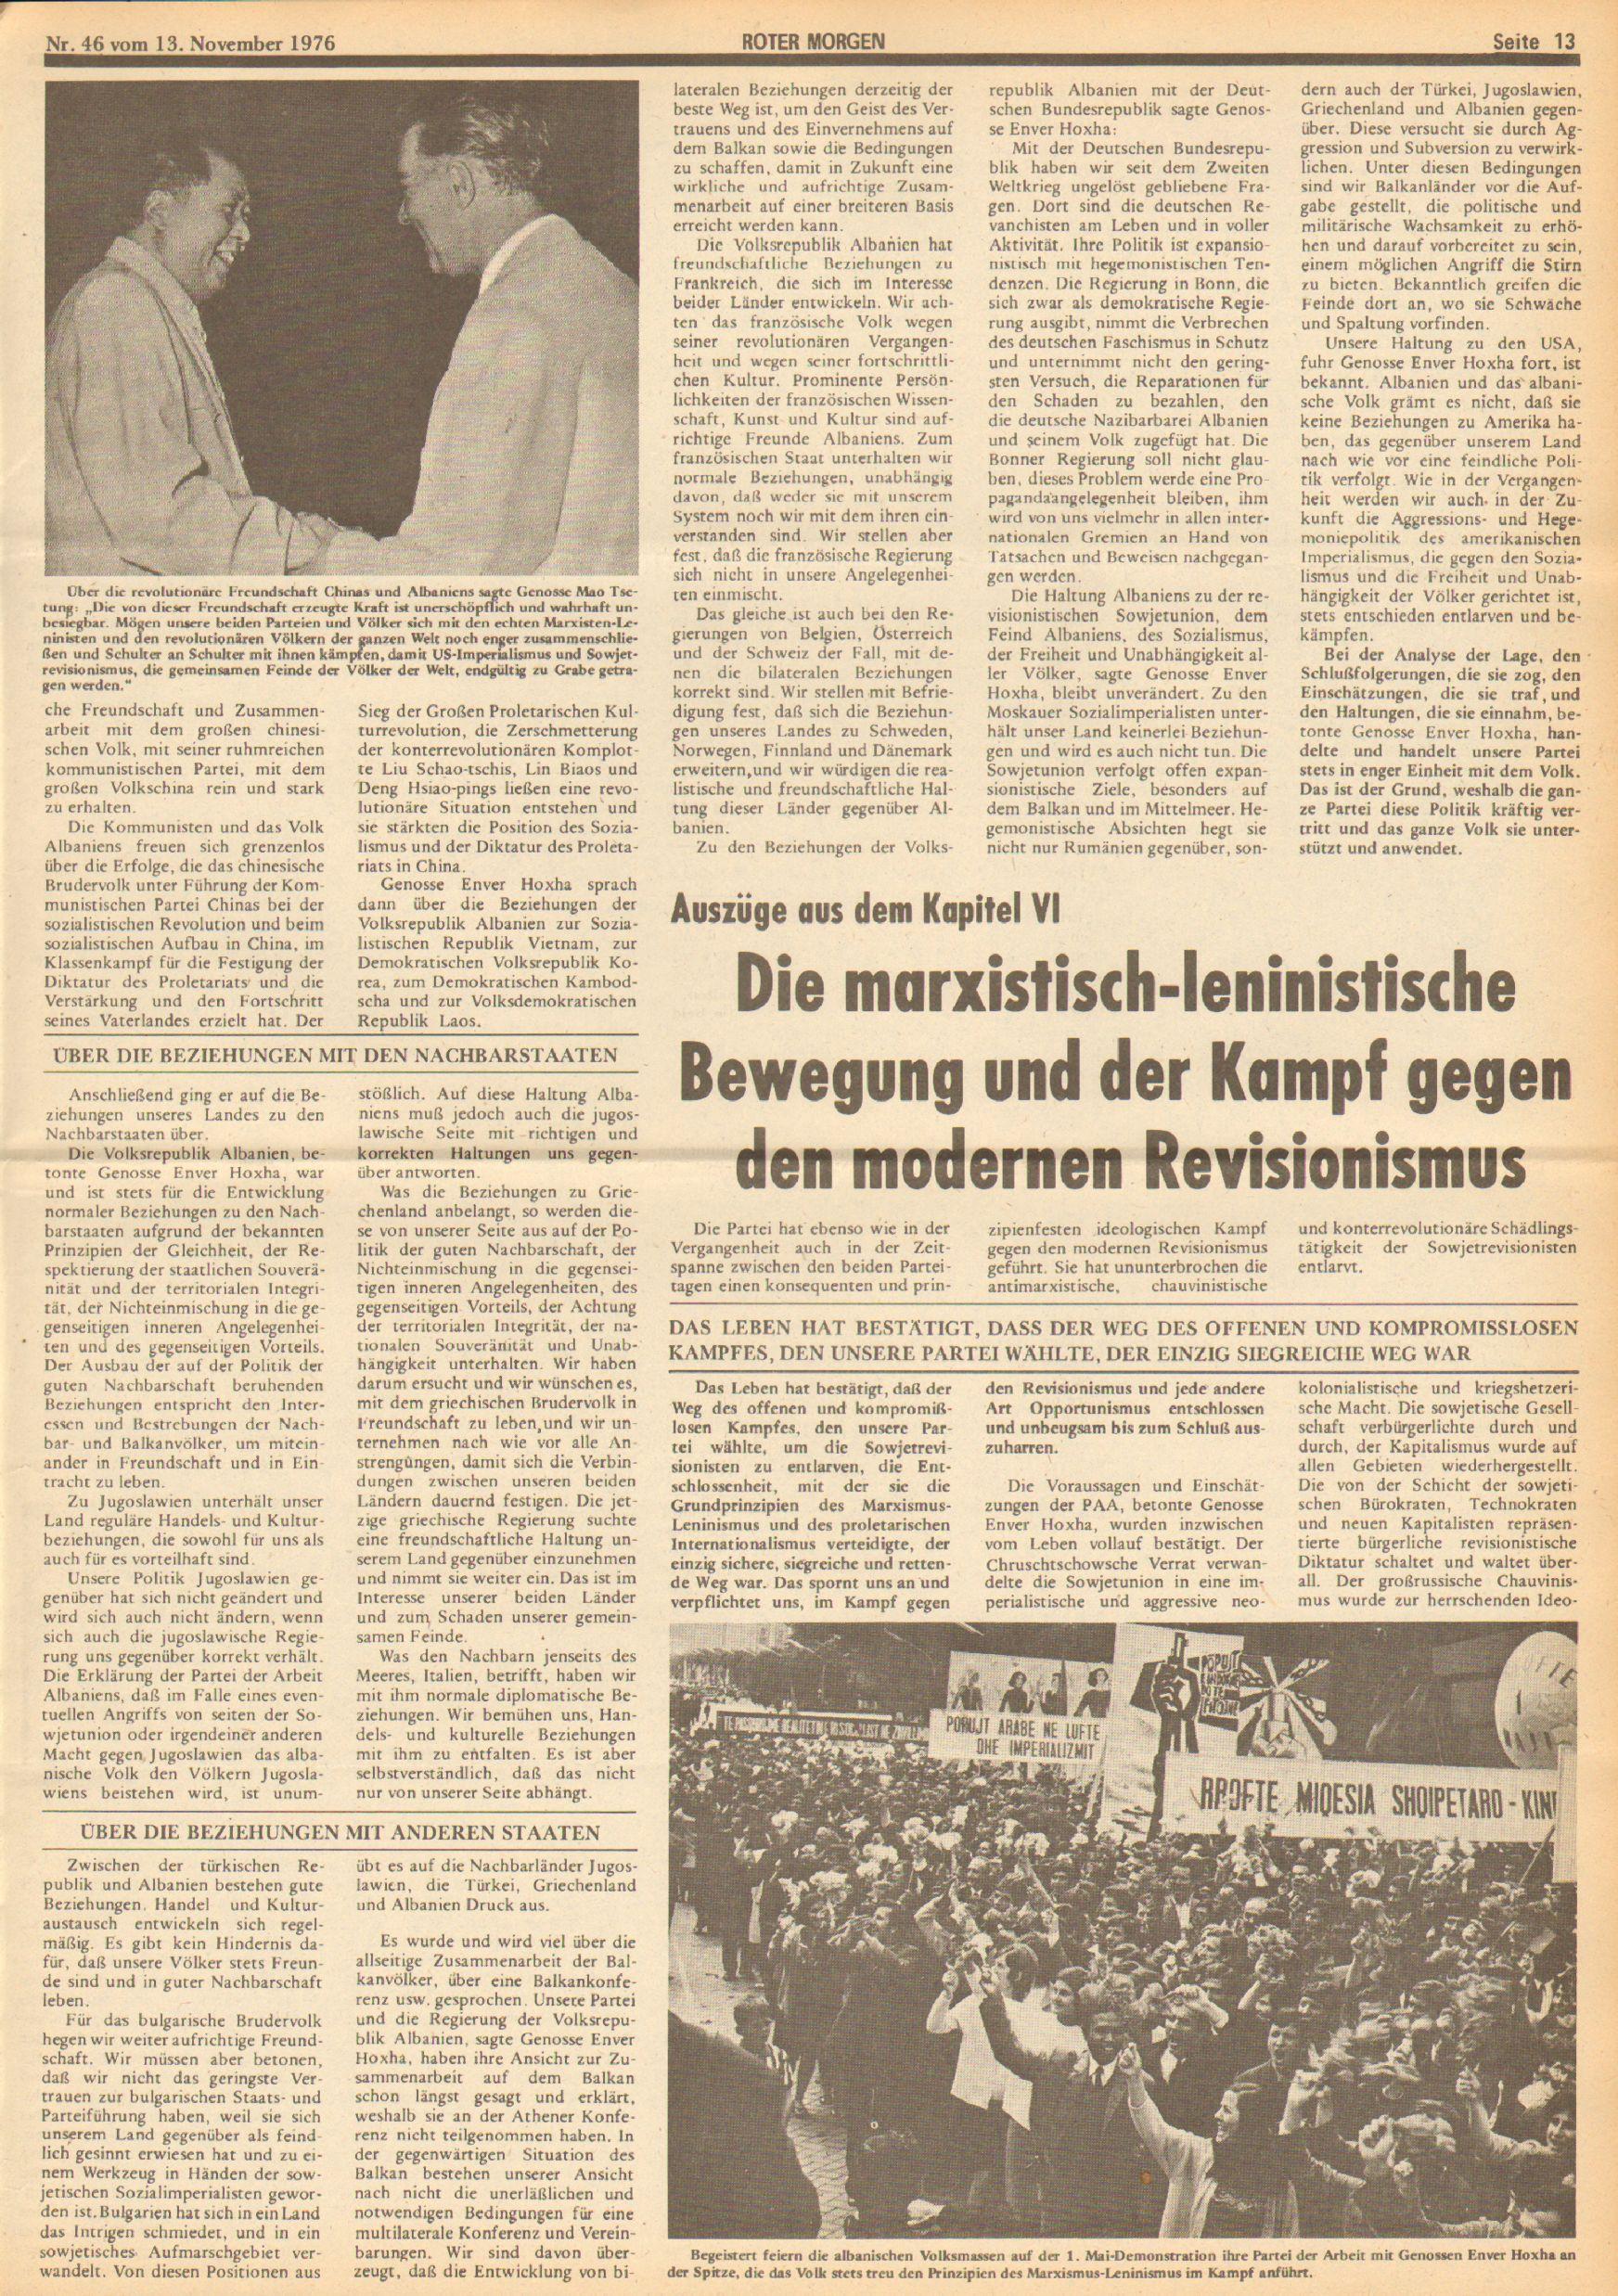 Roter Morgen, 10. Jg., 13. November 1976, Nr. 46, Seite 13